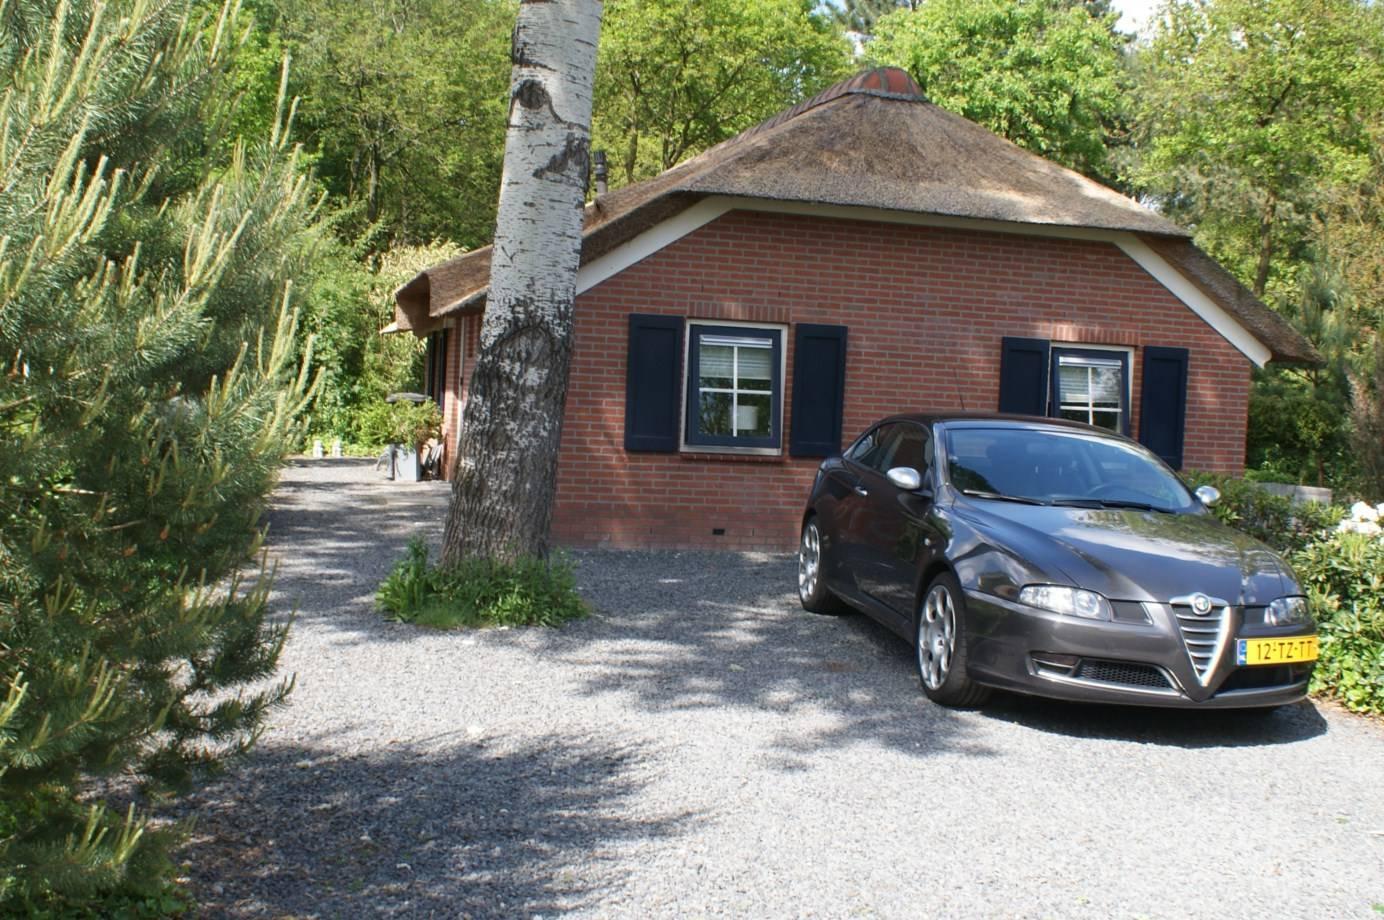 Ons vakantiehuis in Ermelo